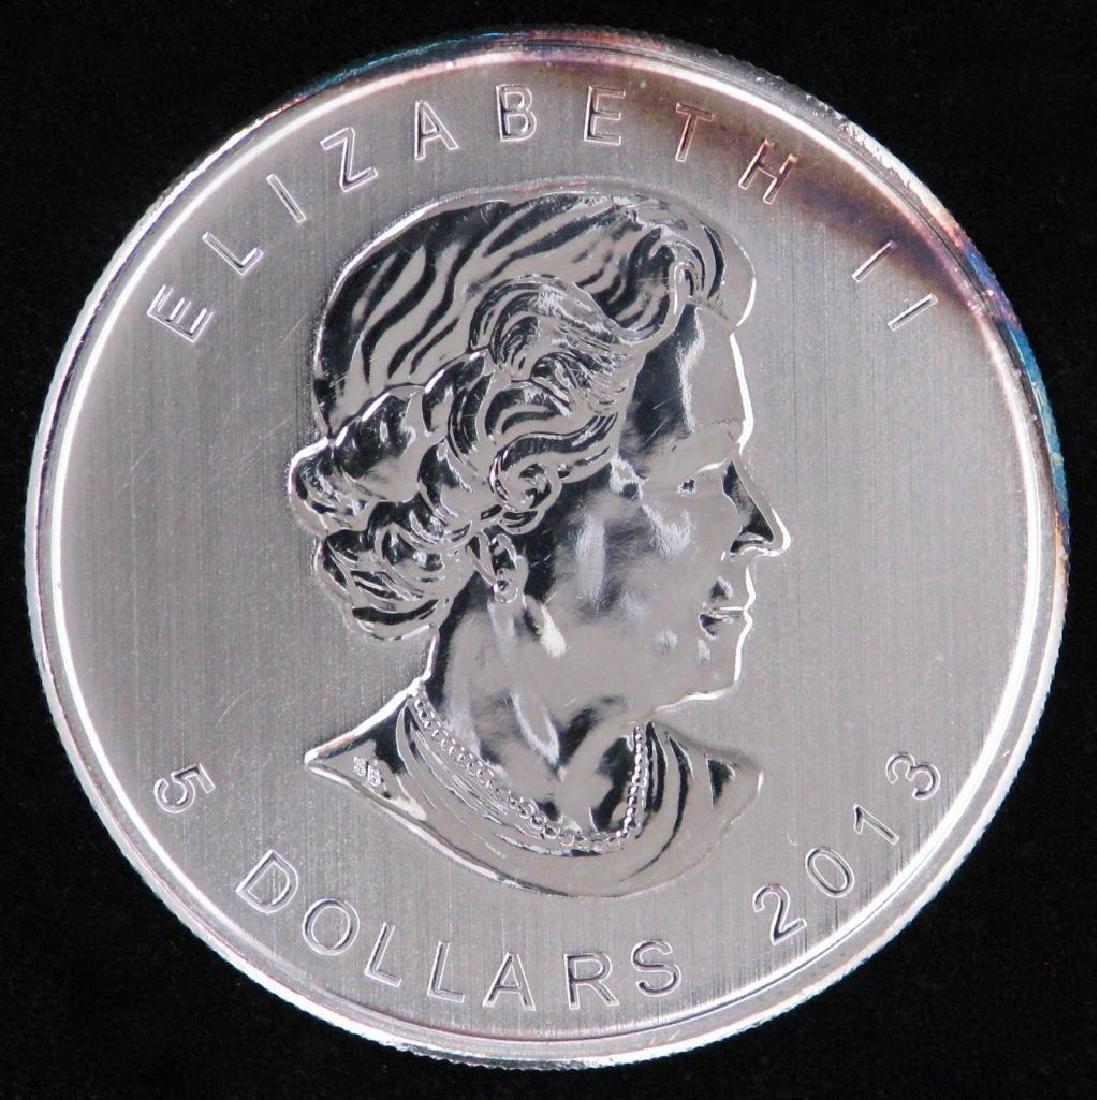 Lot of 2 : Commemorative Silver Dollar Planchet - Type - 2